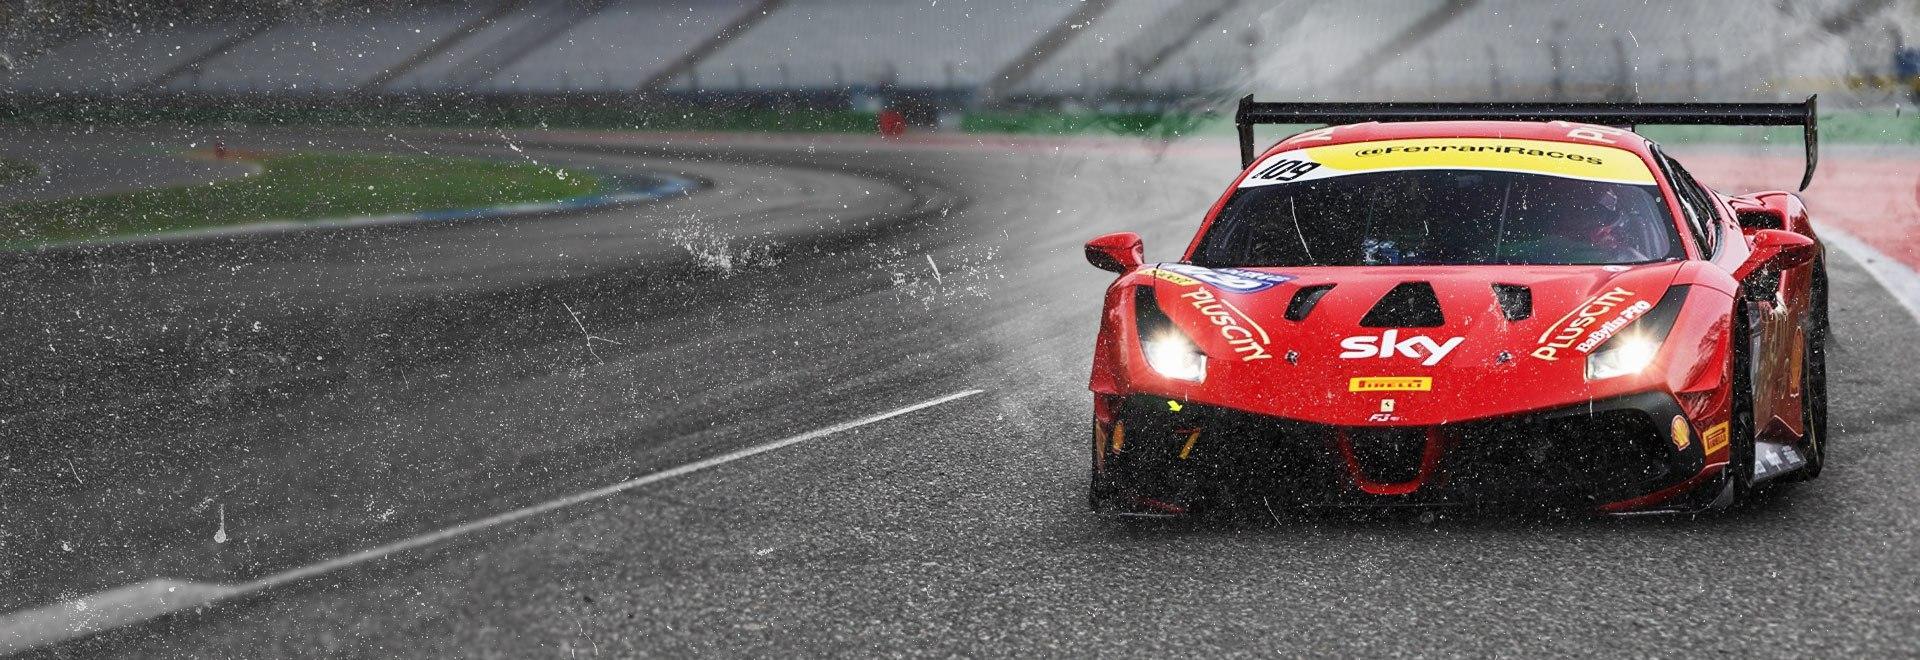 Trofeo Pirelli Spielberg